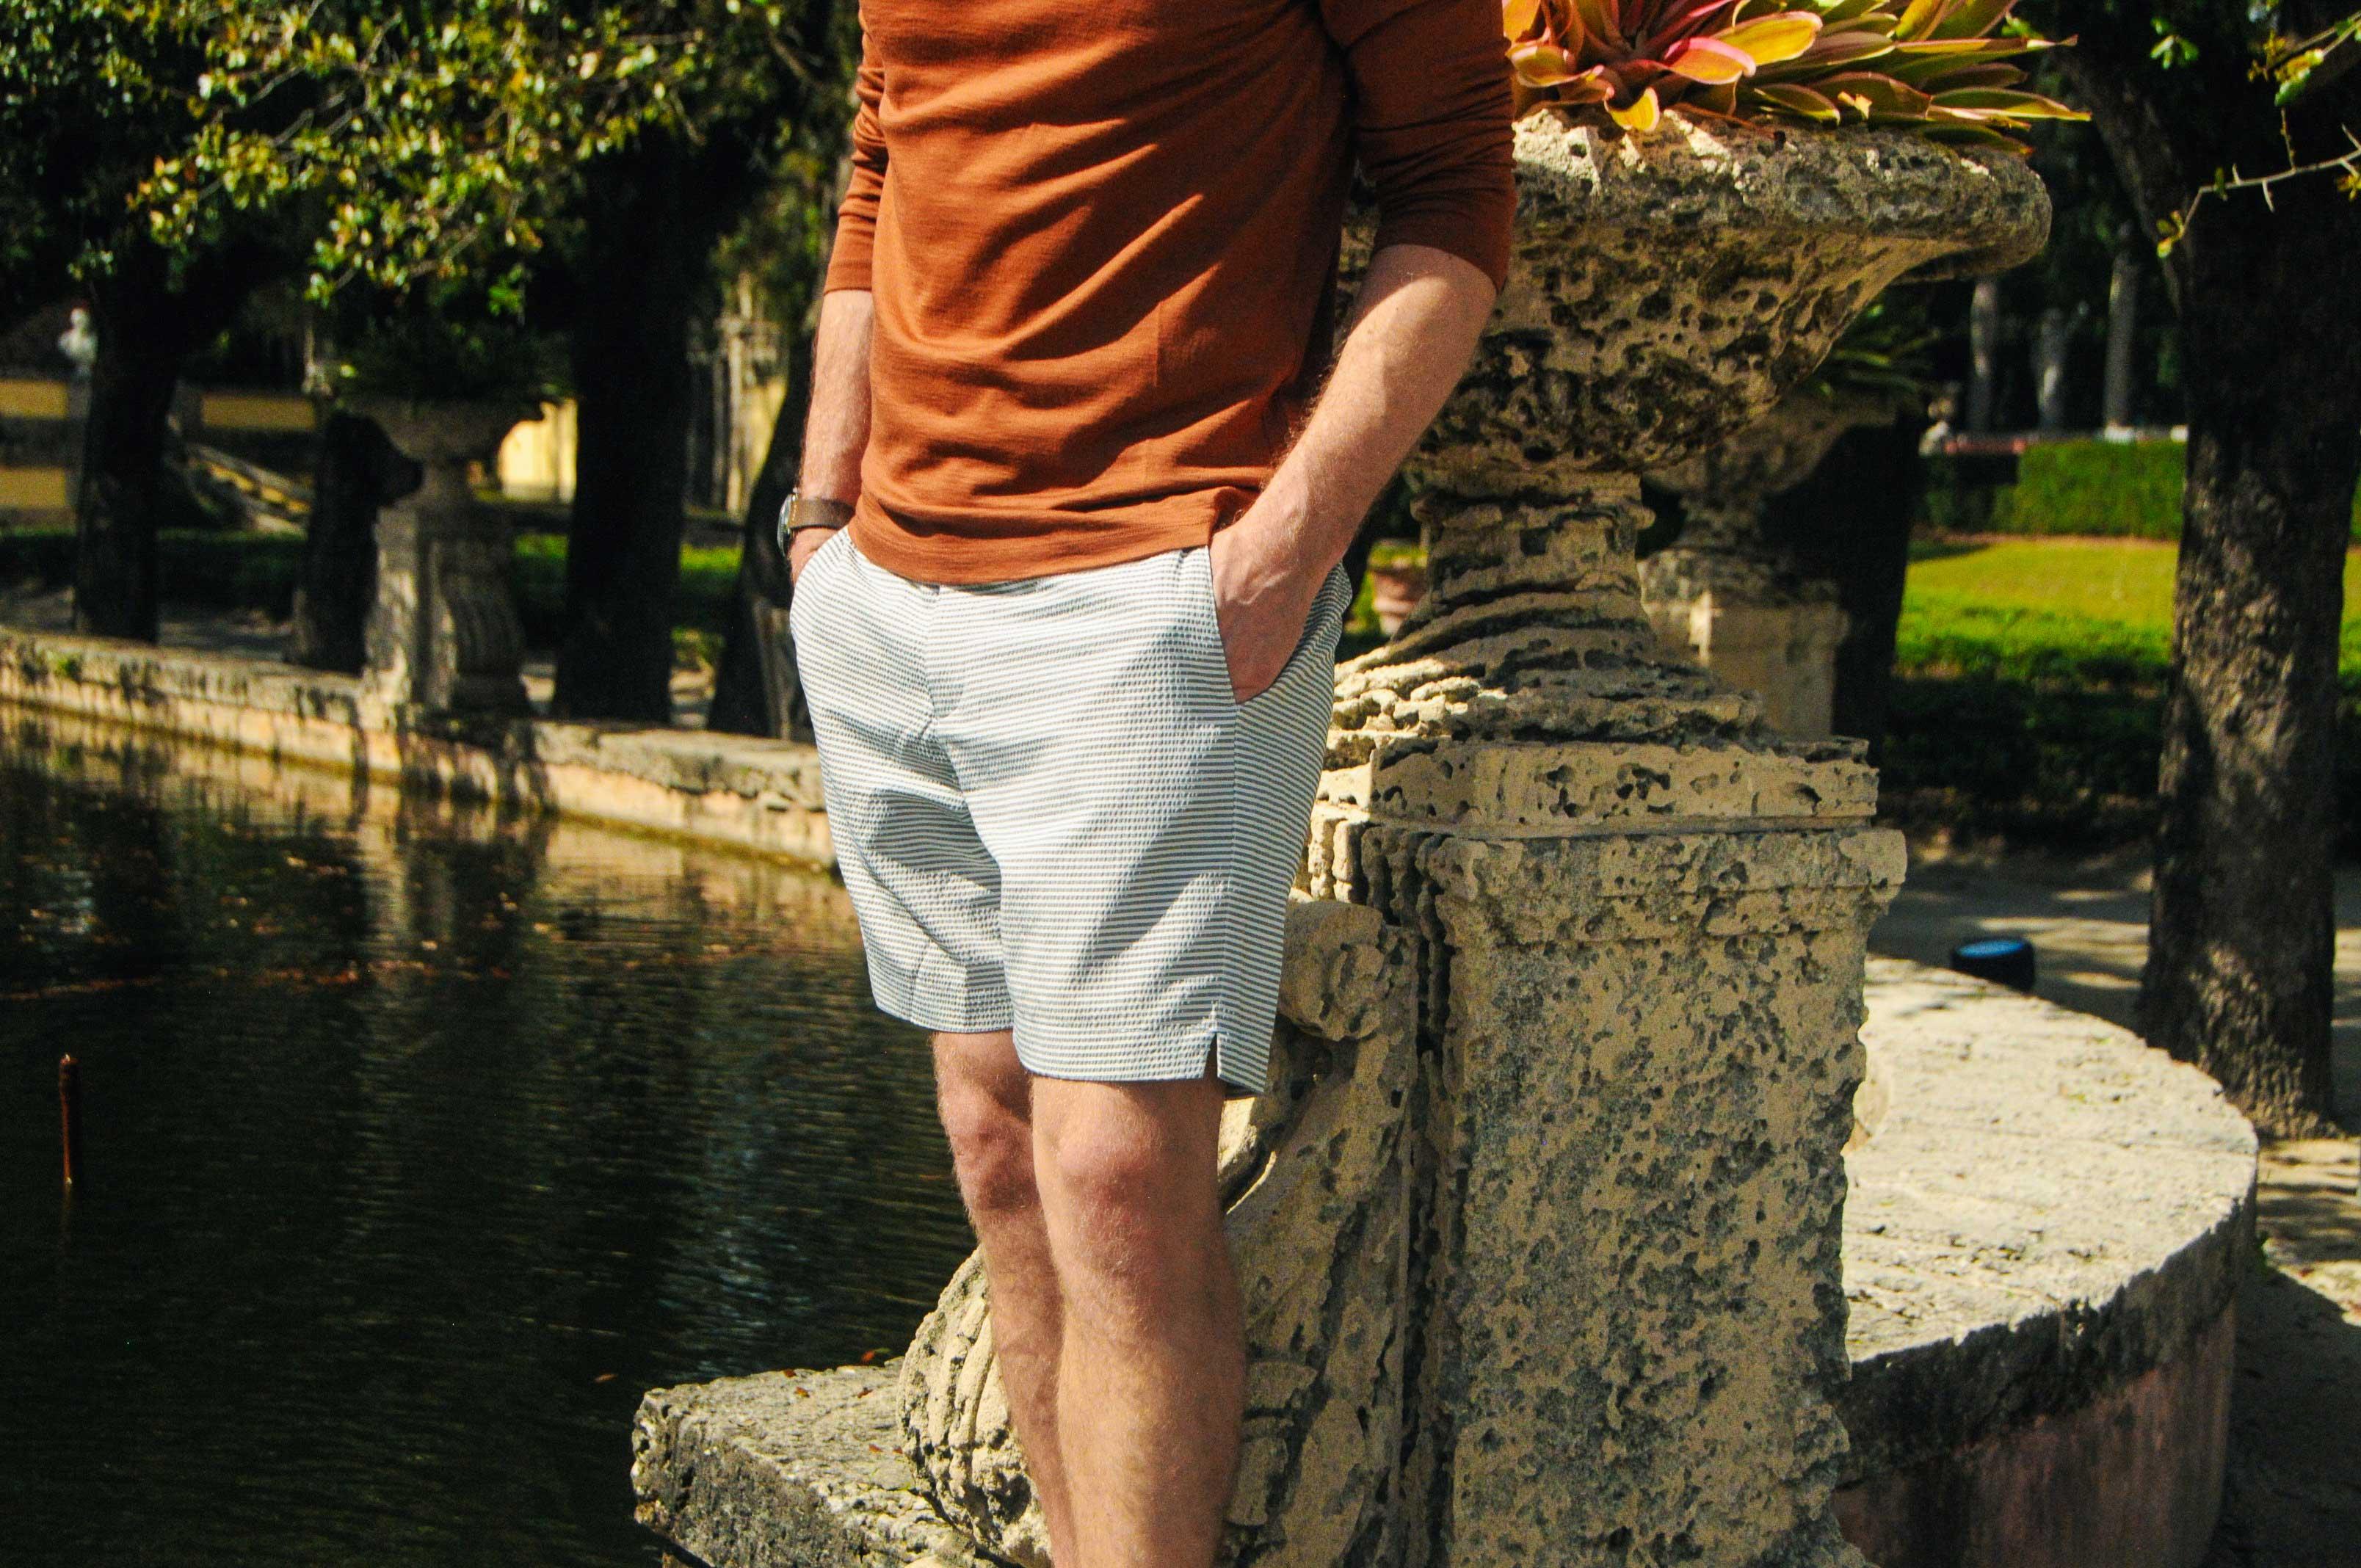 man wearing seersucker shorts and orange cotton tee leaning on pillar